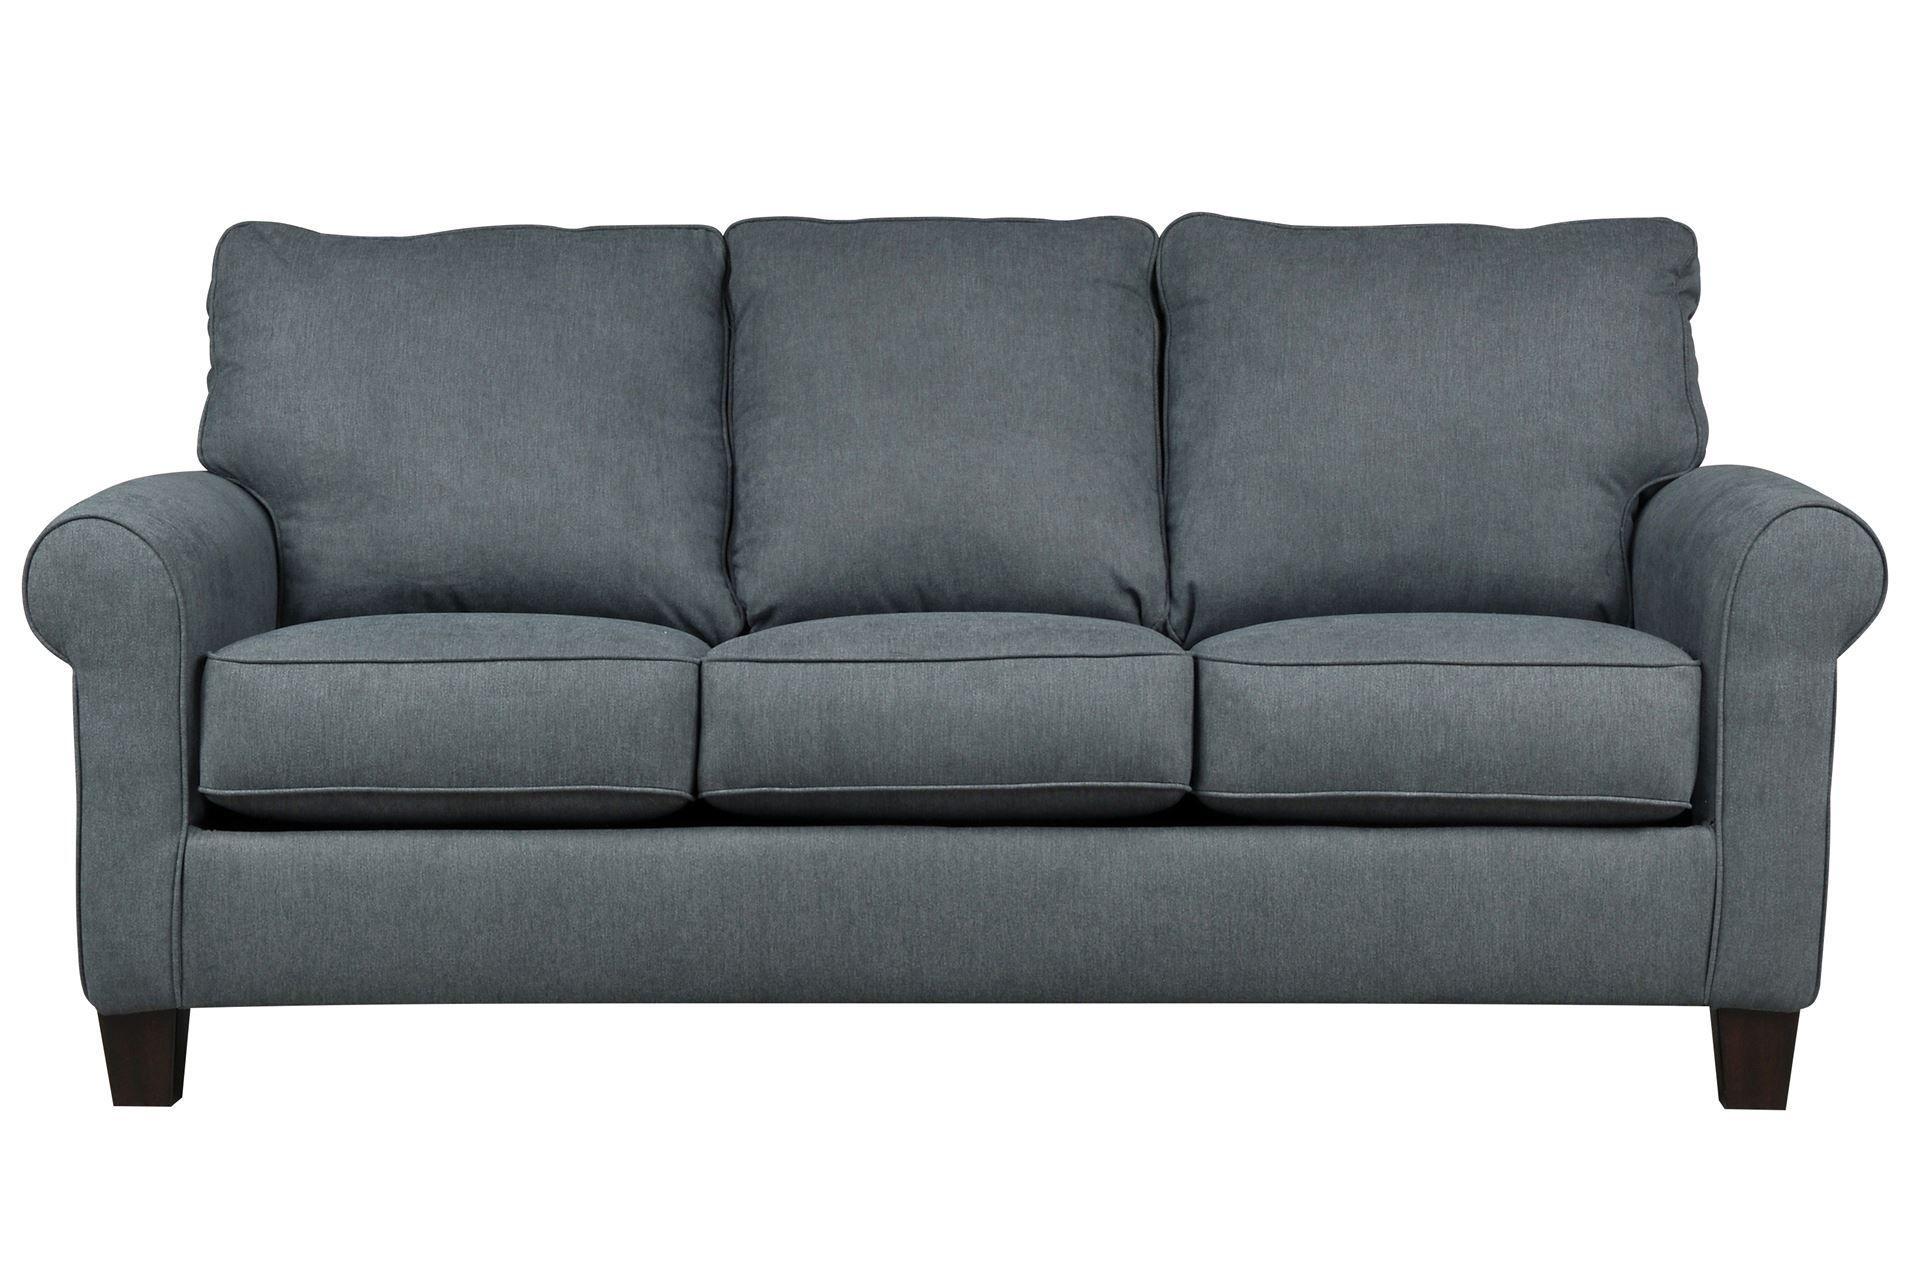 Living Spaces Sleeper Sofa.Zeth Denim Full Sofa Sleeper Signature Sugarshack